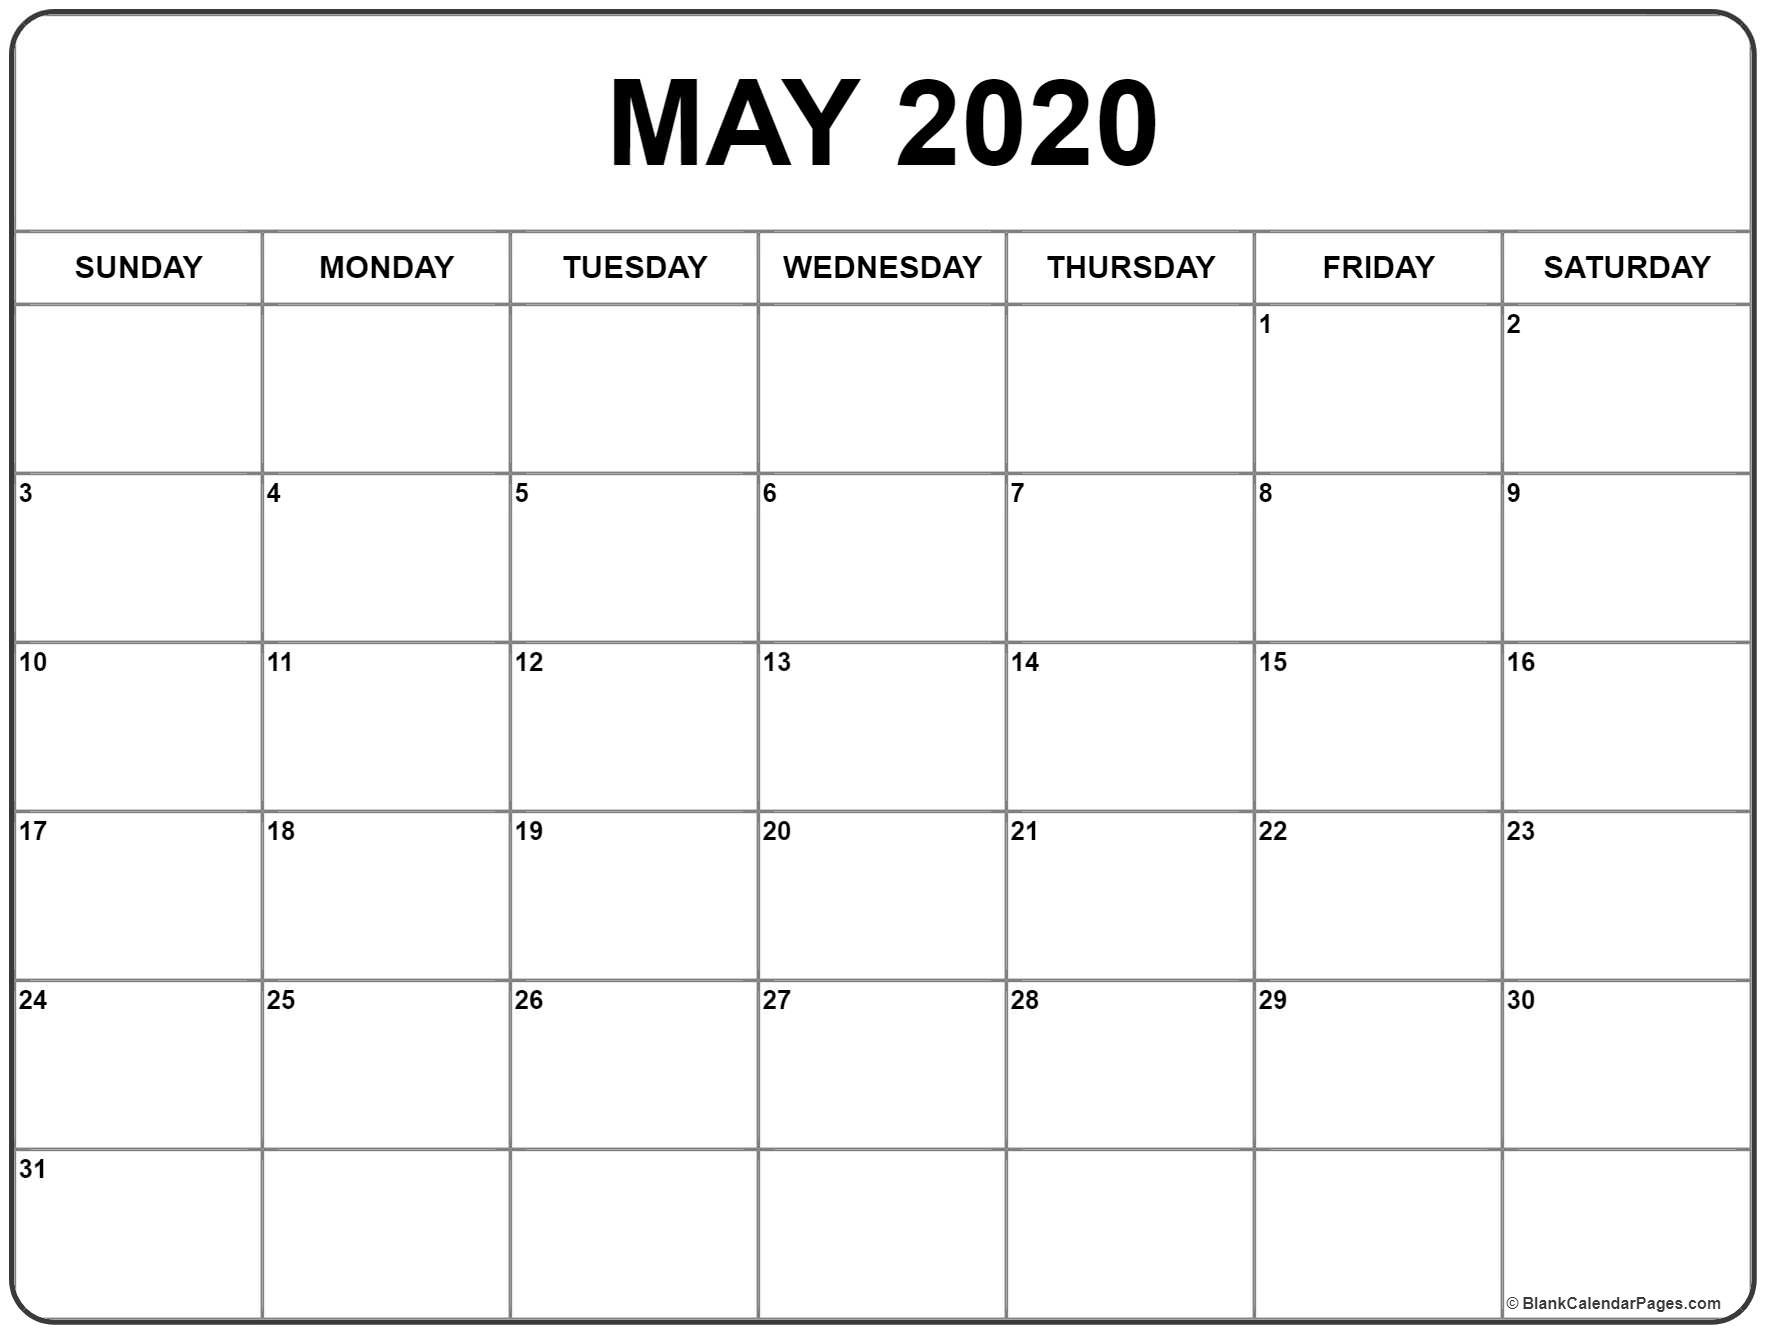 May 2020 Calendar   Free Printable Monthly Calendars regarding Free Printable 2020 Calendar With Space To Write